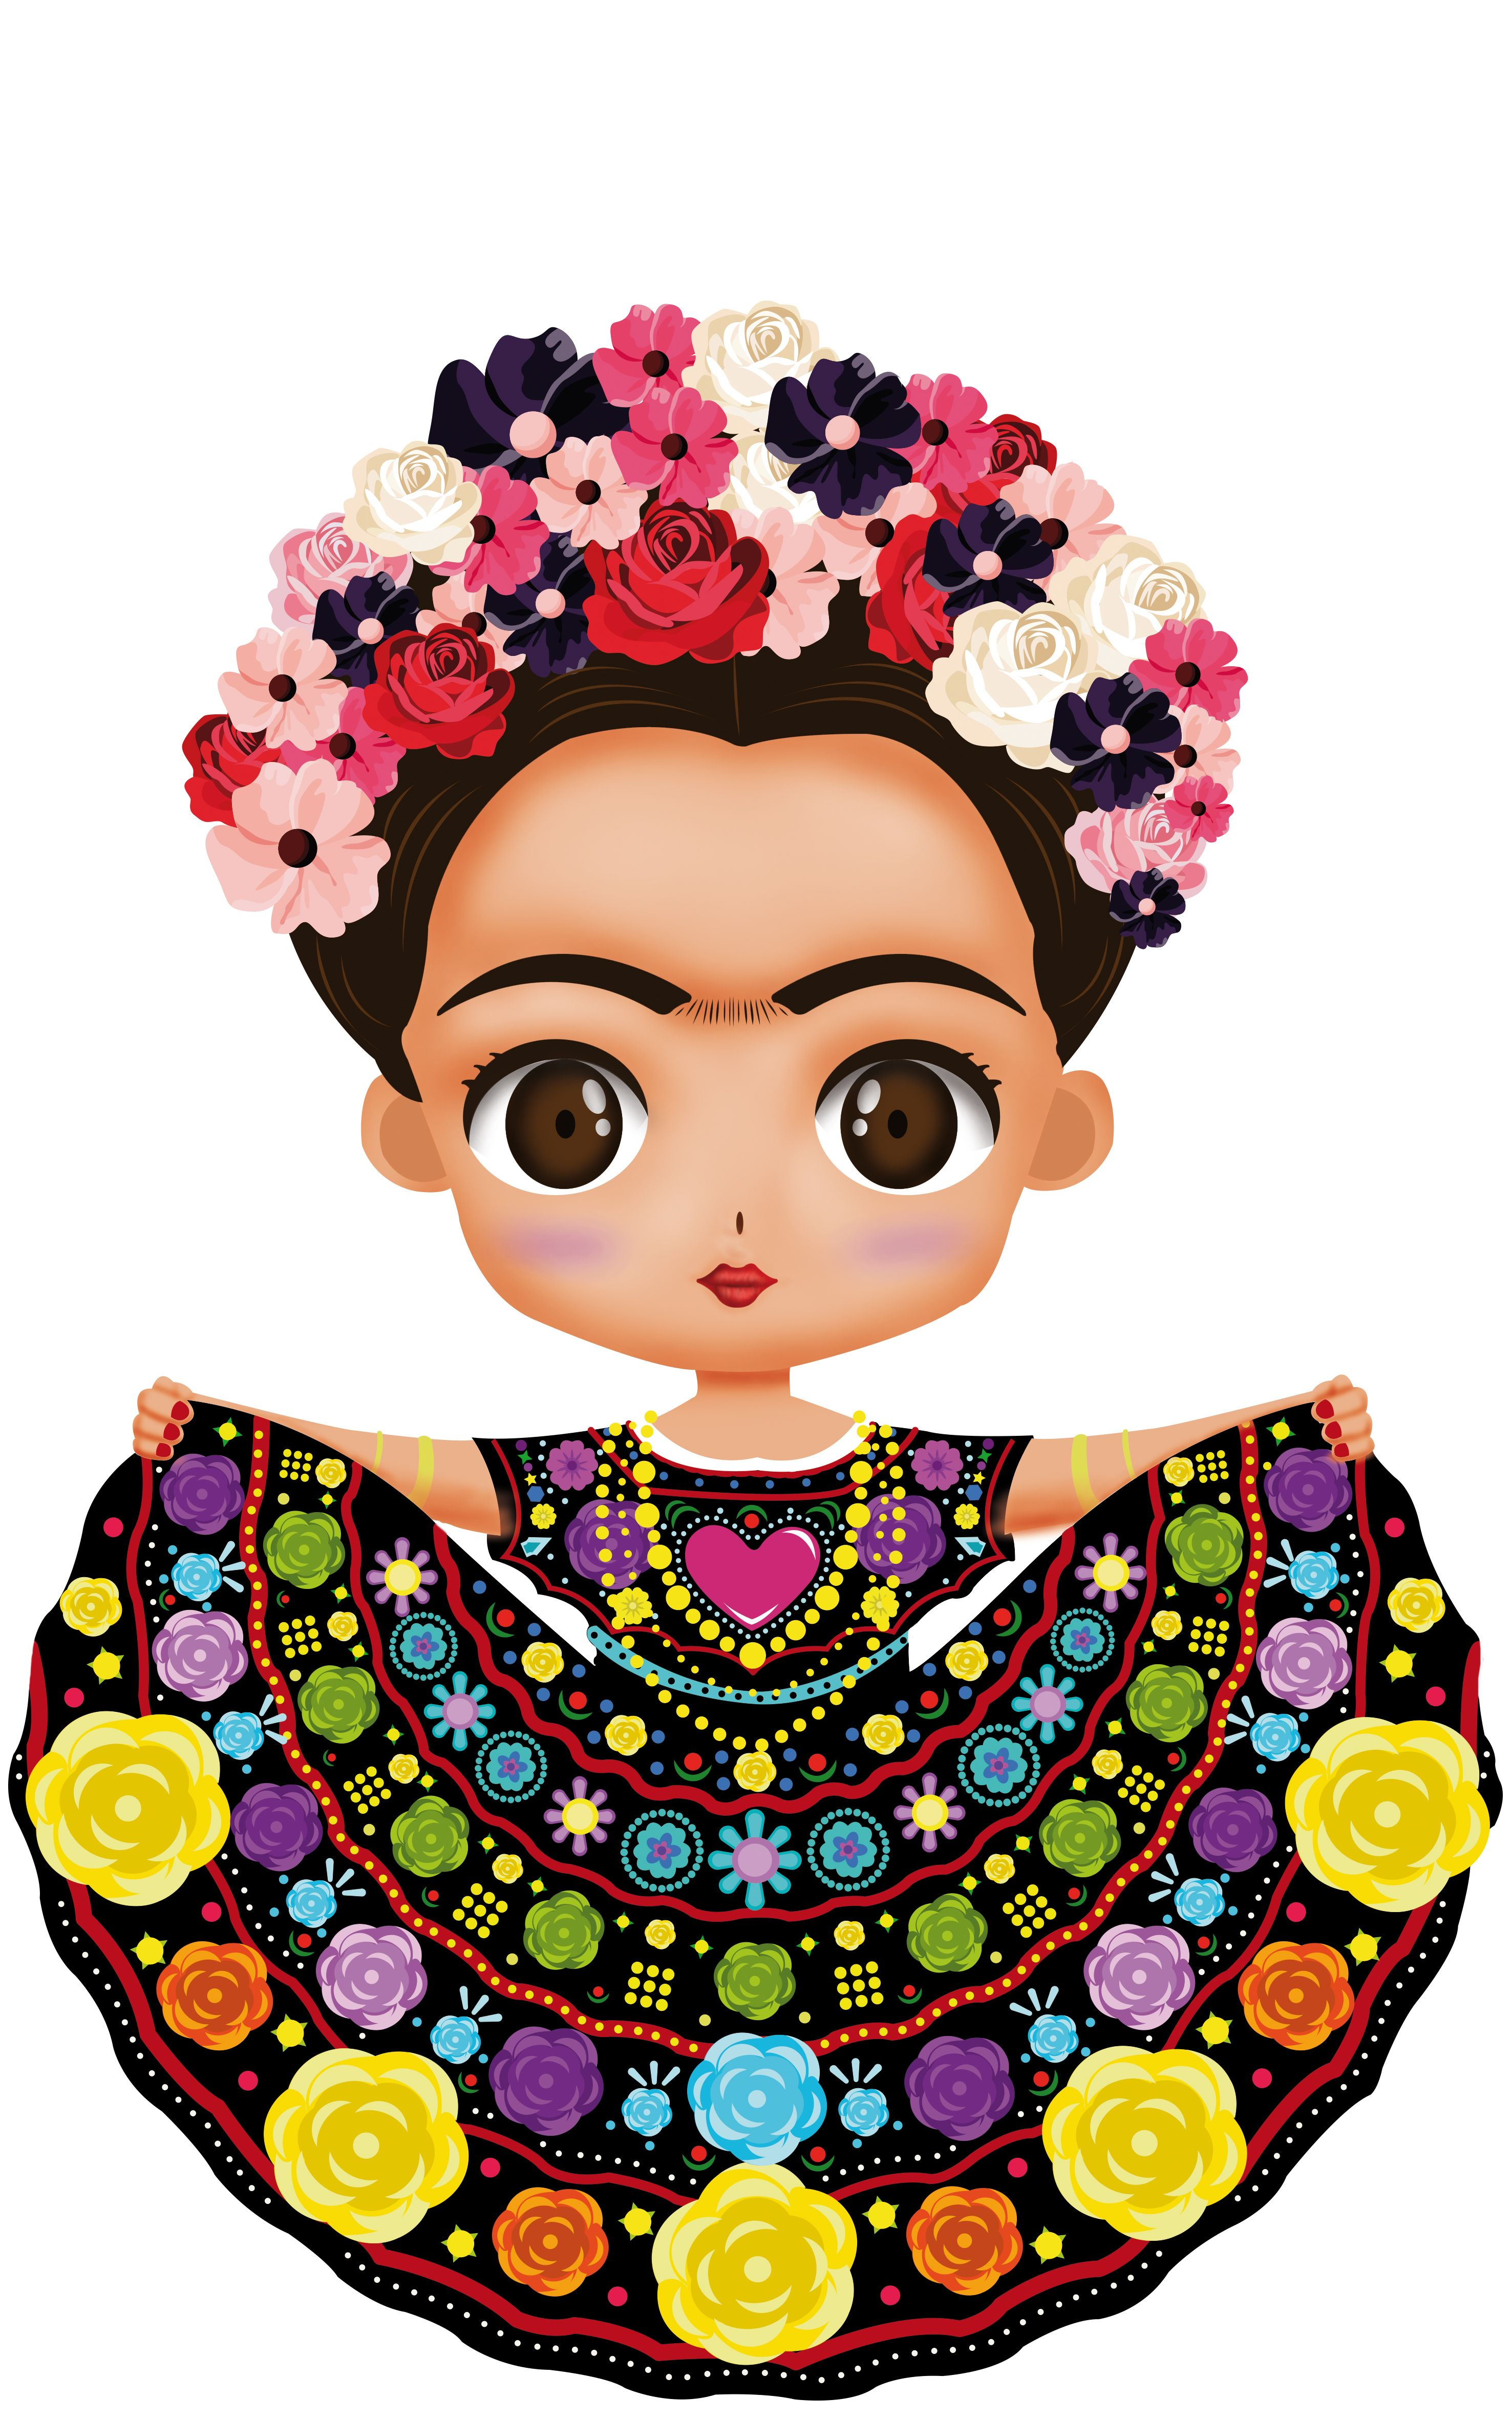 Pin De Miriam Galarza En Ideas De Fondos De Pantalla Imagenes De Frida Kahlo Frida Kahlo Caricatura Frida Kahlo Dibujo